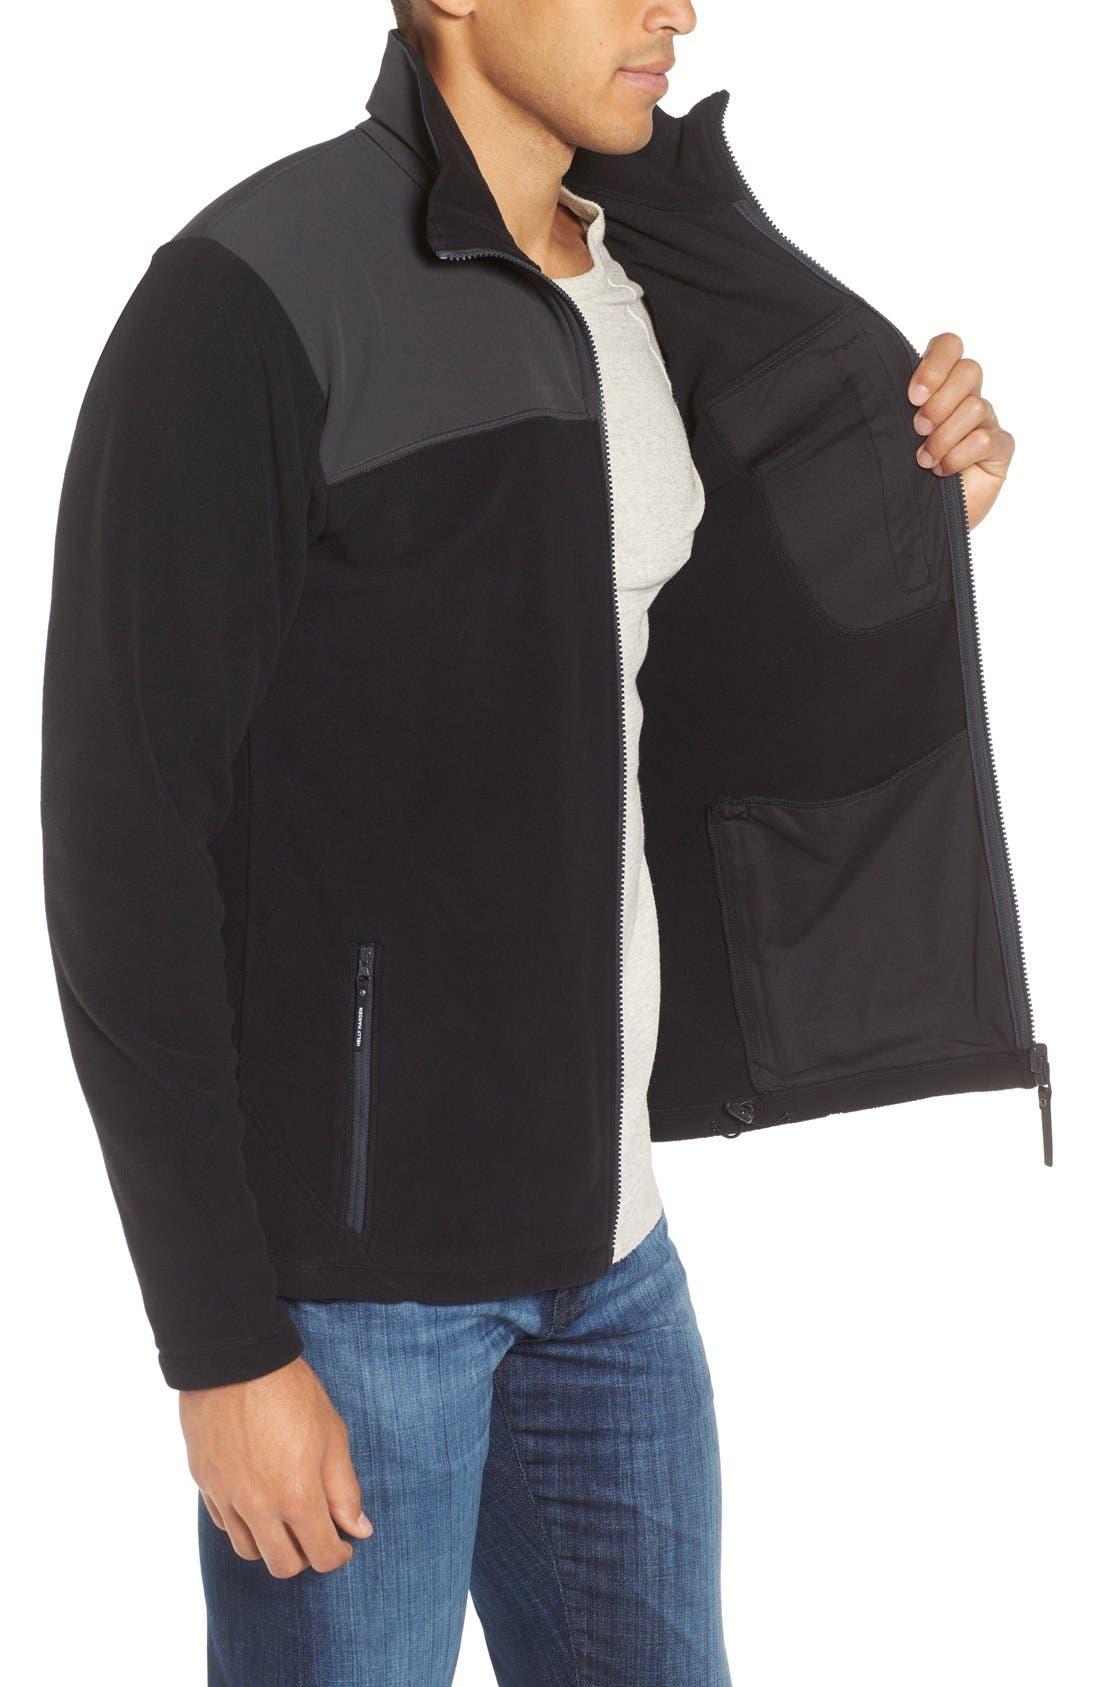 Alternate Image 3  - Helly Hansen Sitka Fleece Jacket